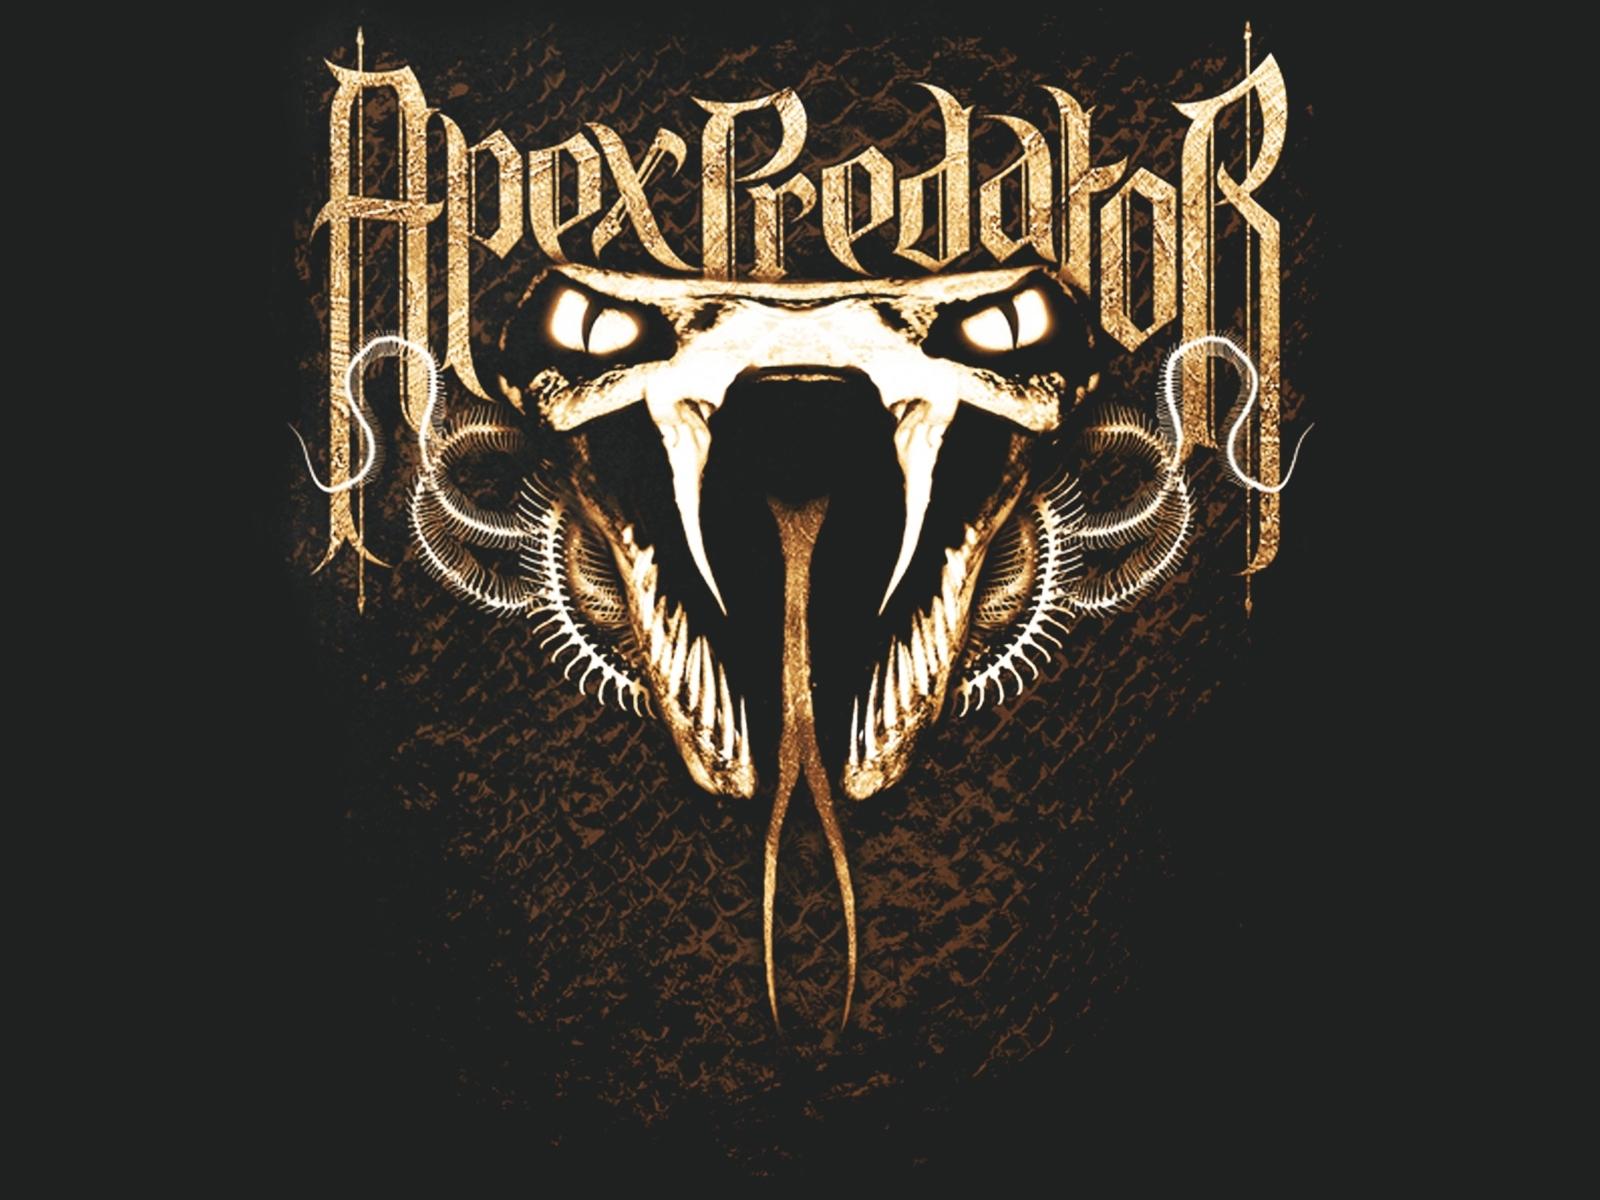 randy orton apex predator logo | nerdoms for christmas pressie